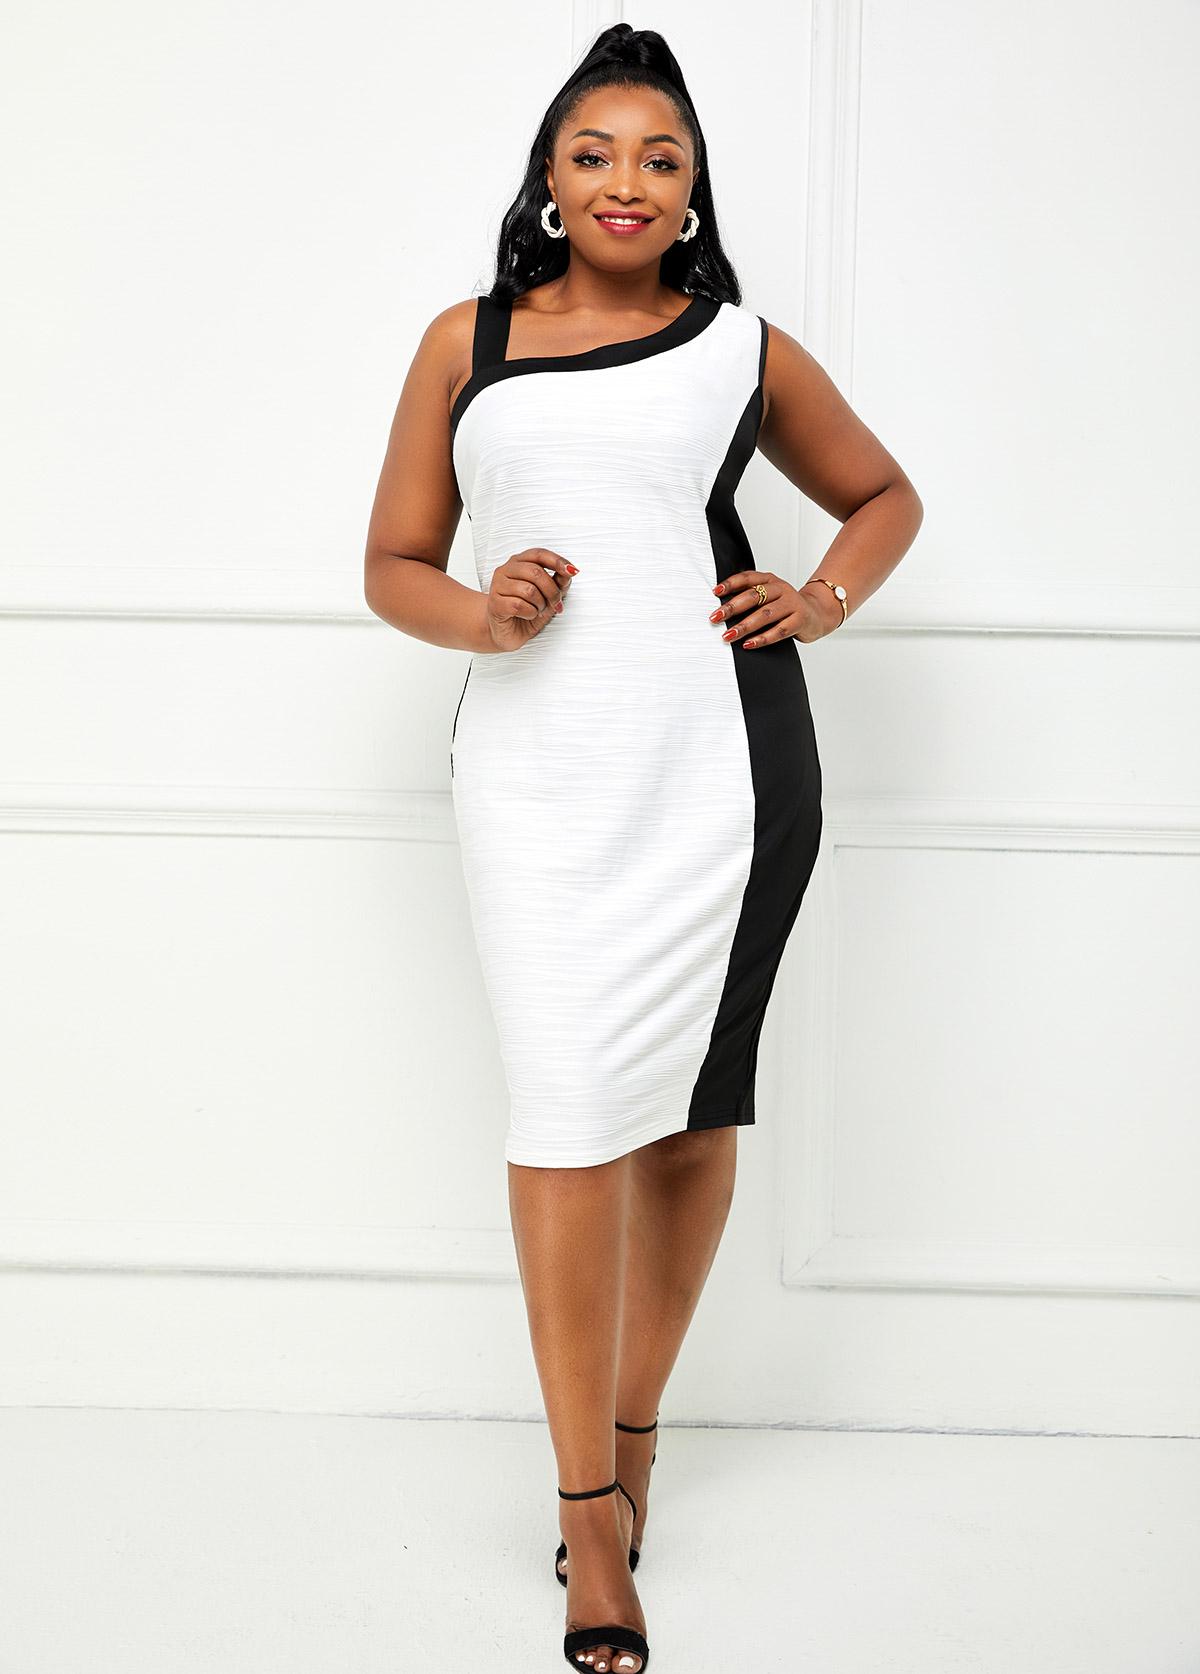 Contrast Plus Size Skew Neck Dress